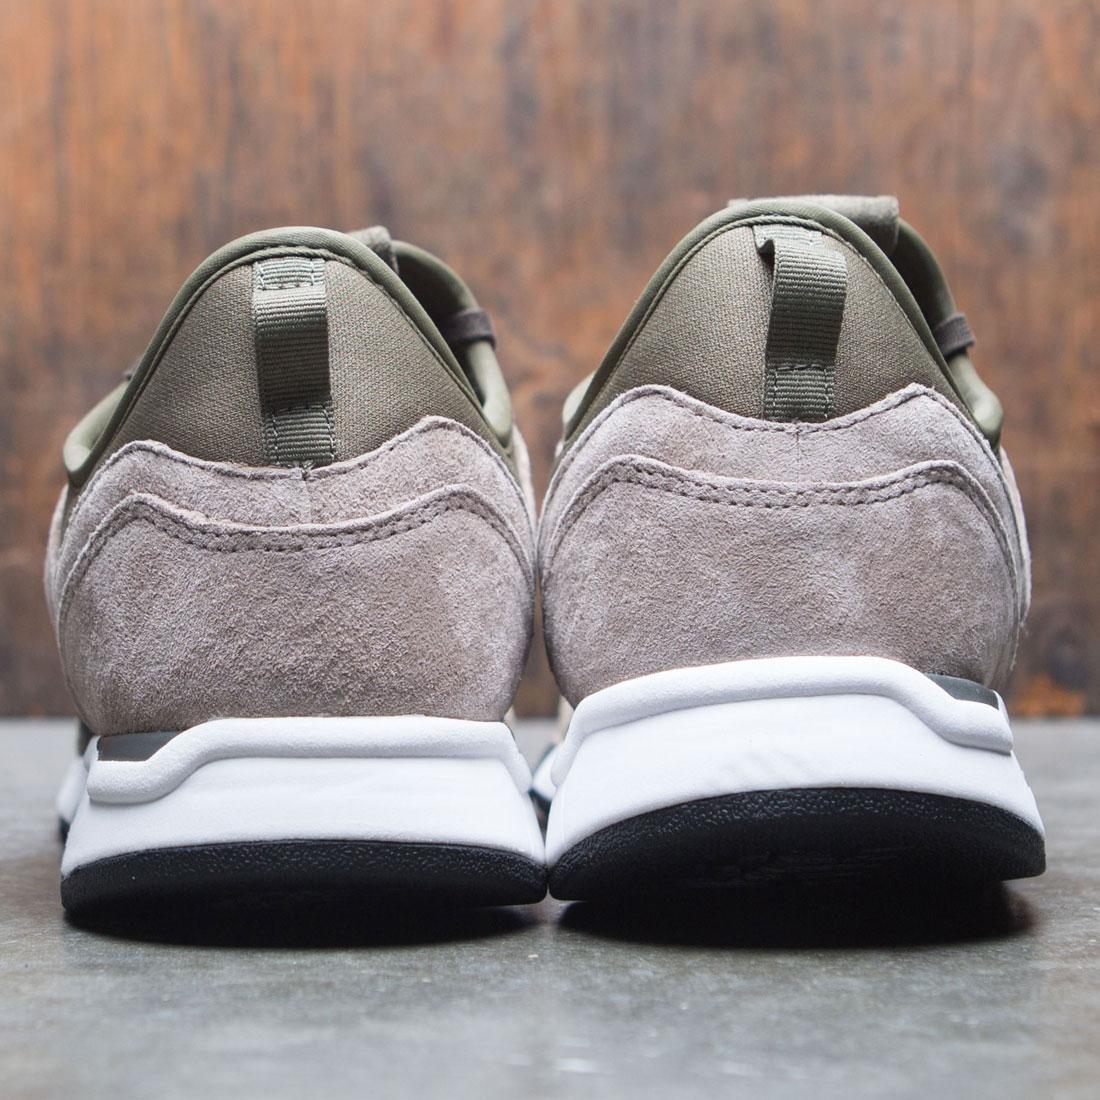 harga sepatu new balance 247 luxe